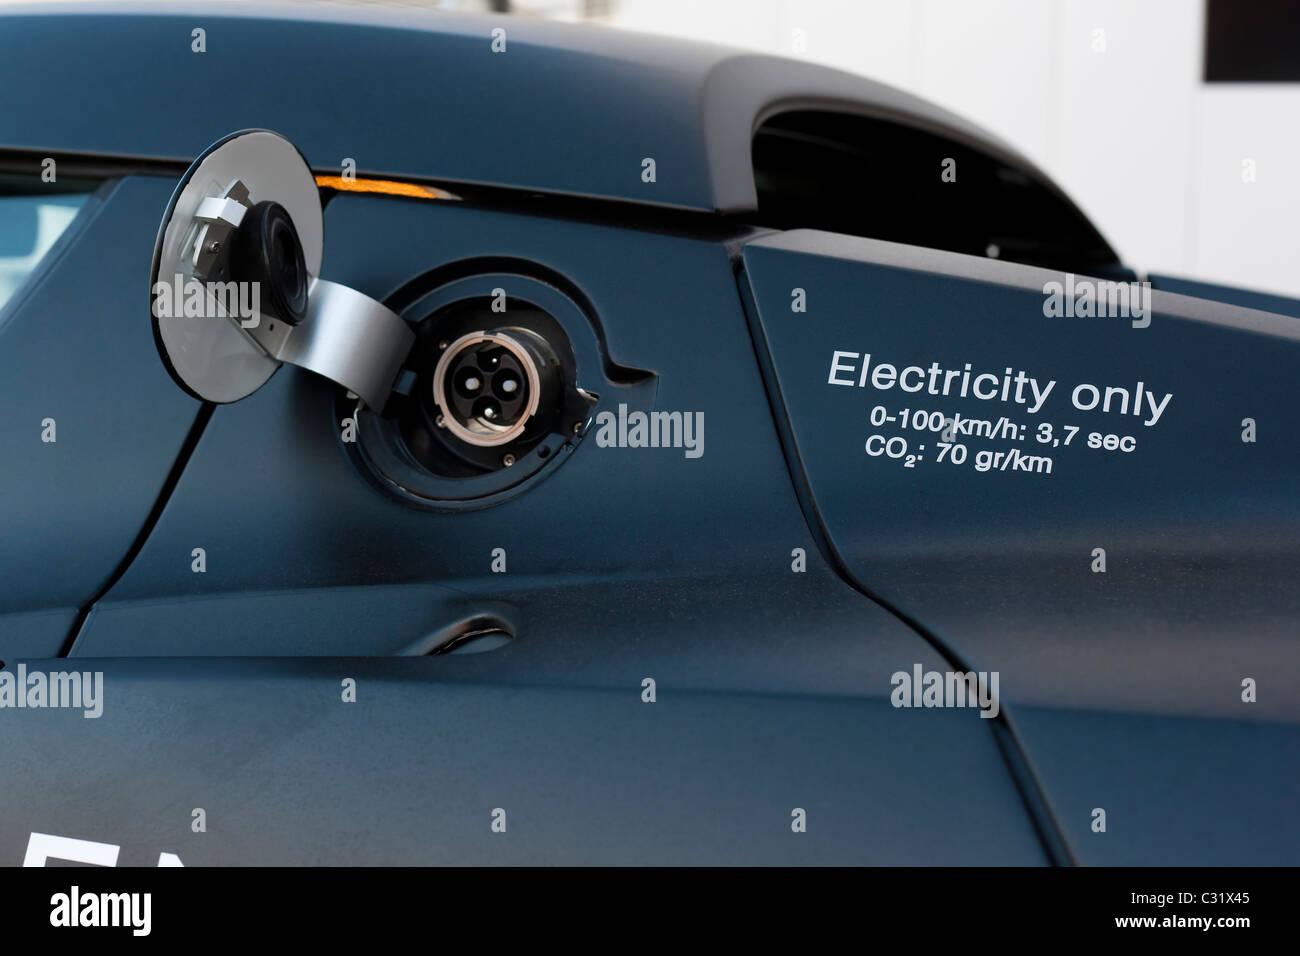 Power socket of a Tesla Roadster electric high performance sports car. Plug in EV. Holland Netherlands Stock Photo